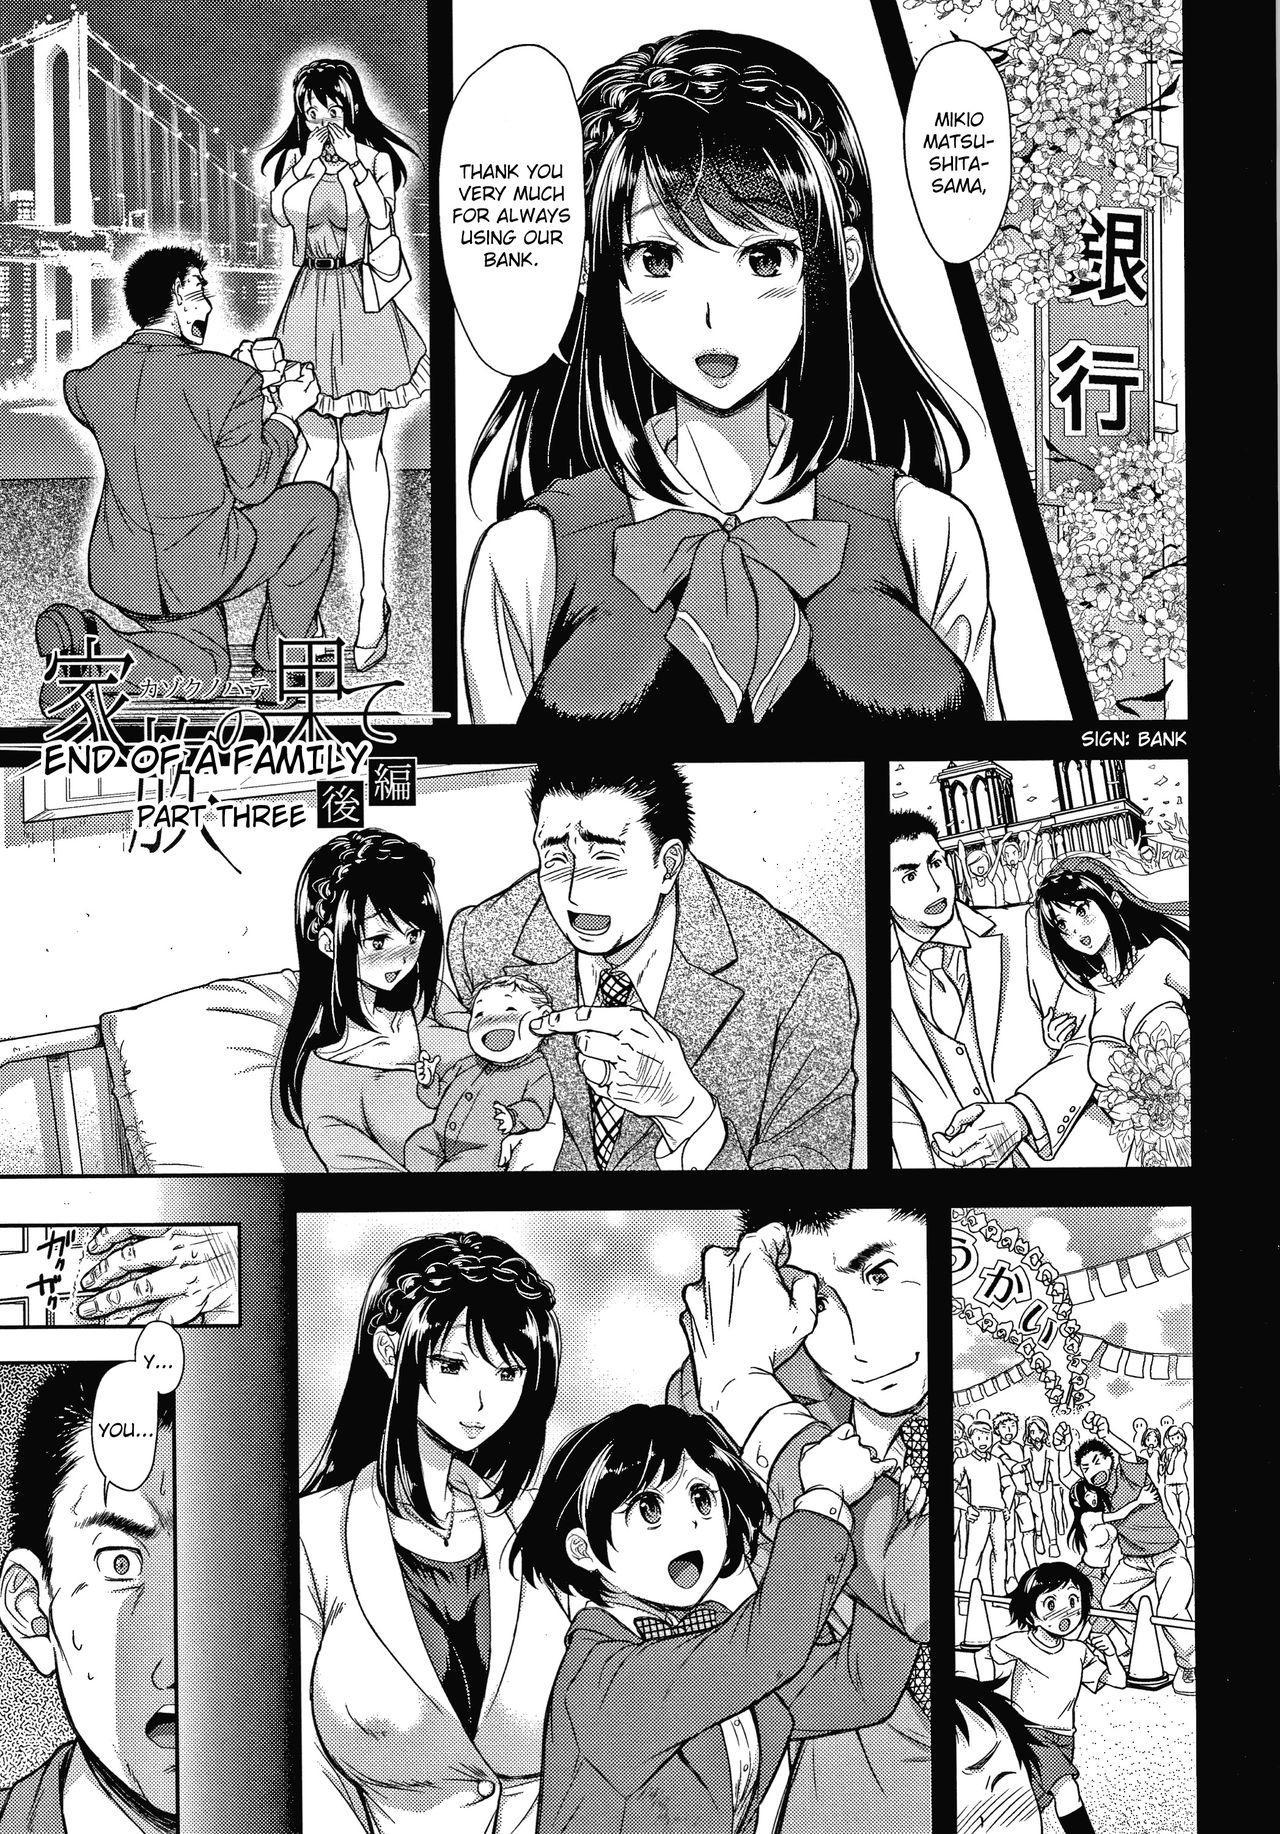 Kazoku no Hate   End of a Family 54